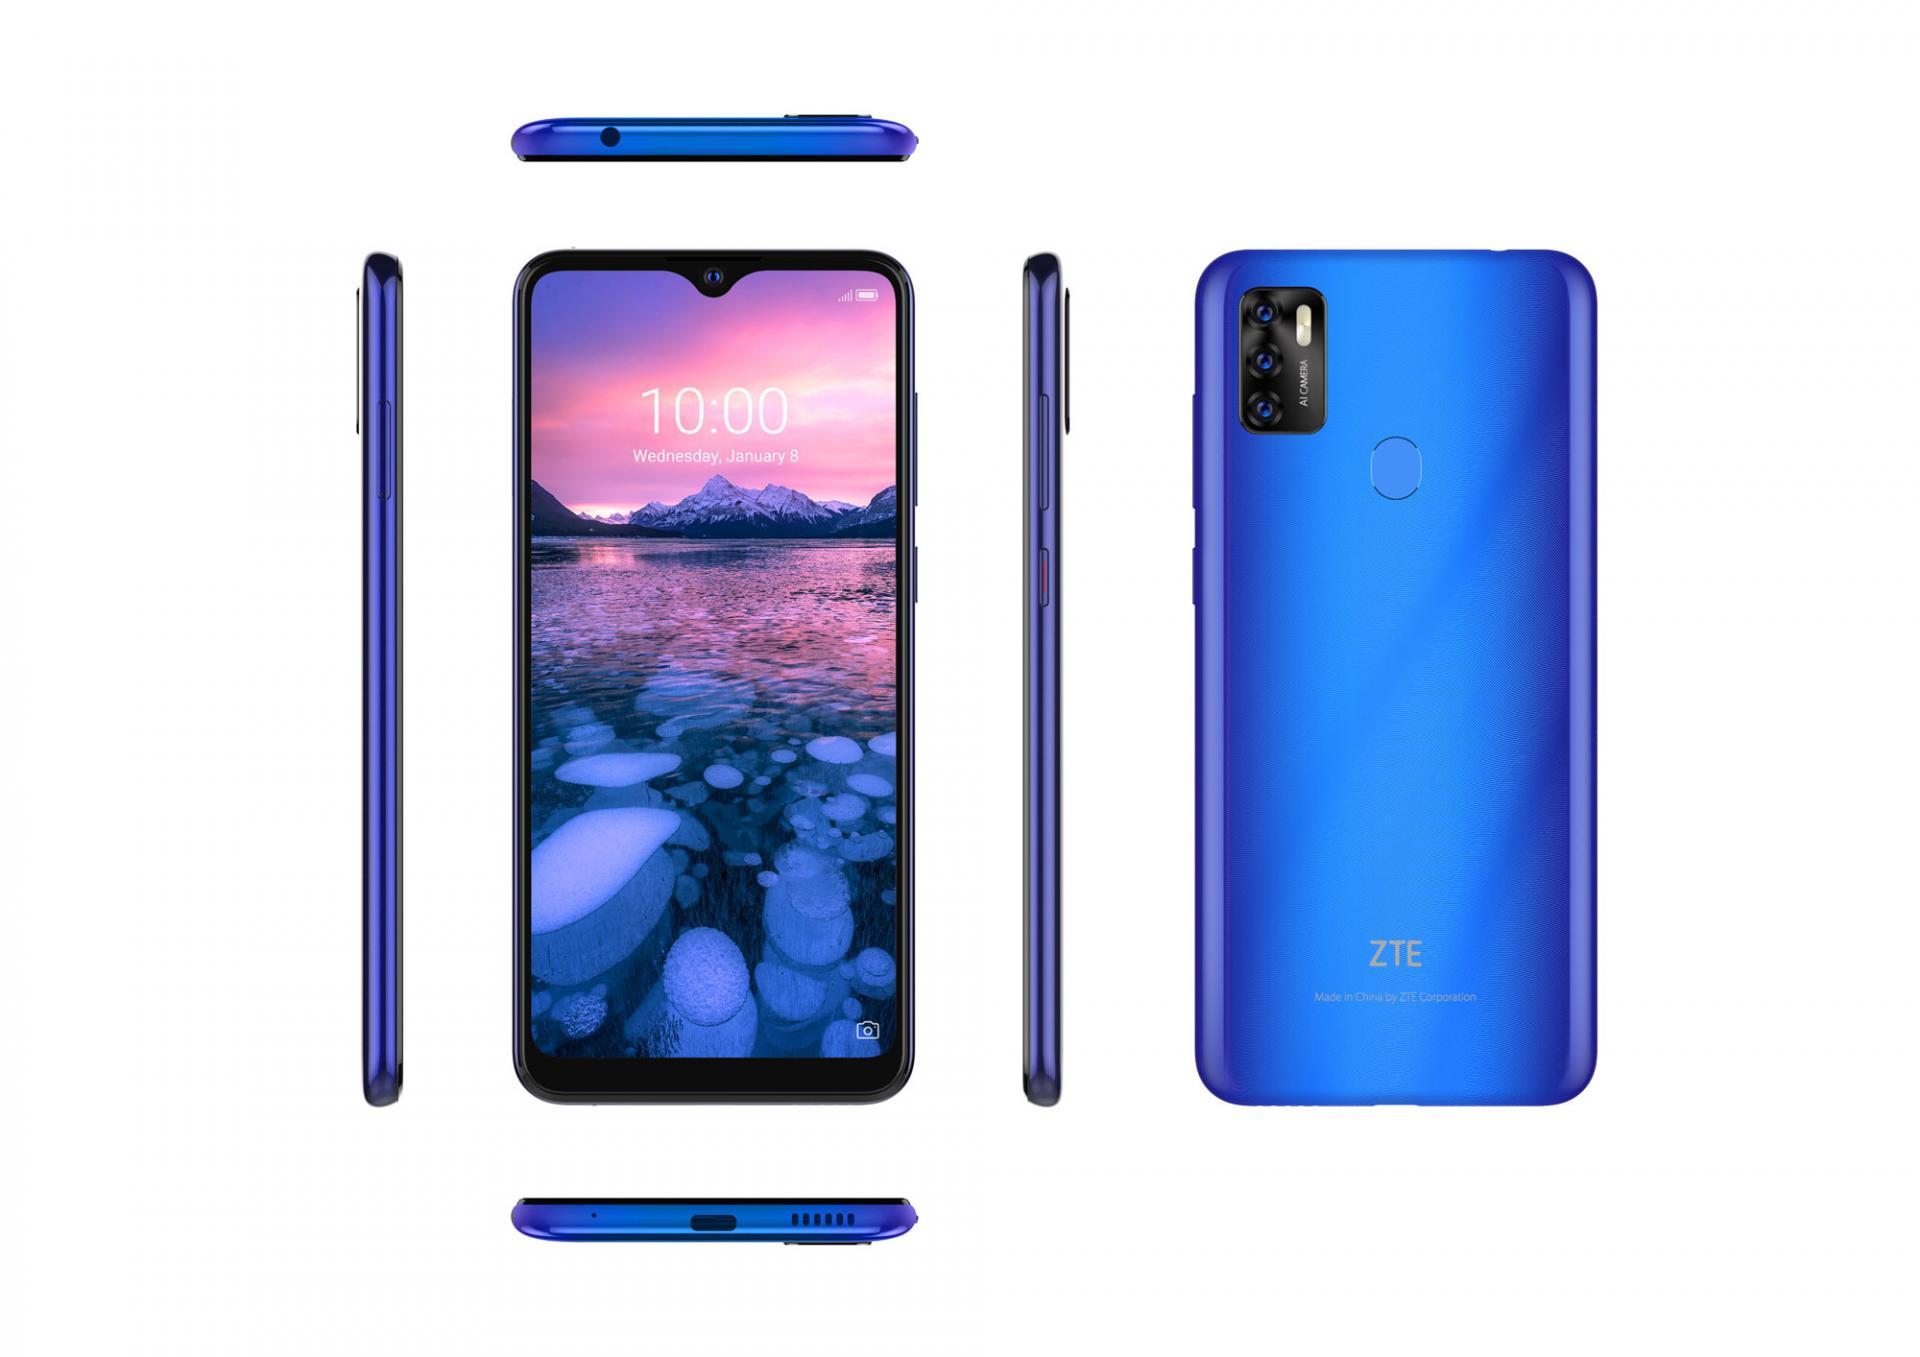 9990 рублей засмартфон ZTE Blade A7s 2020. Отдадите?